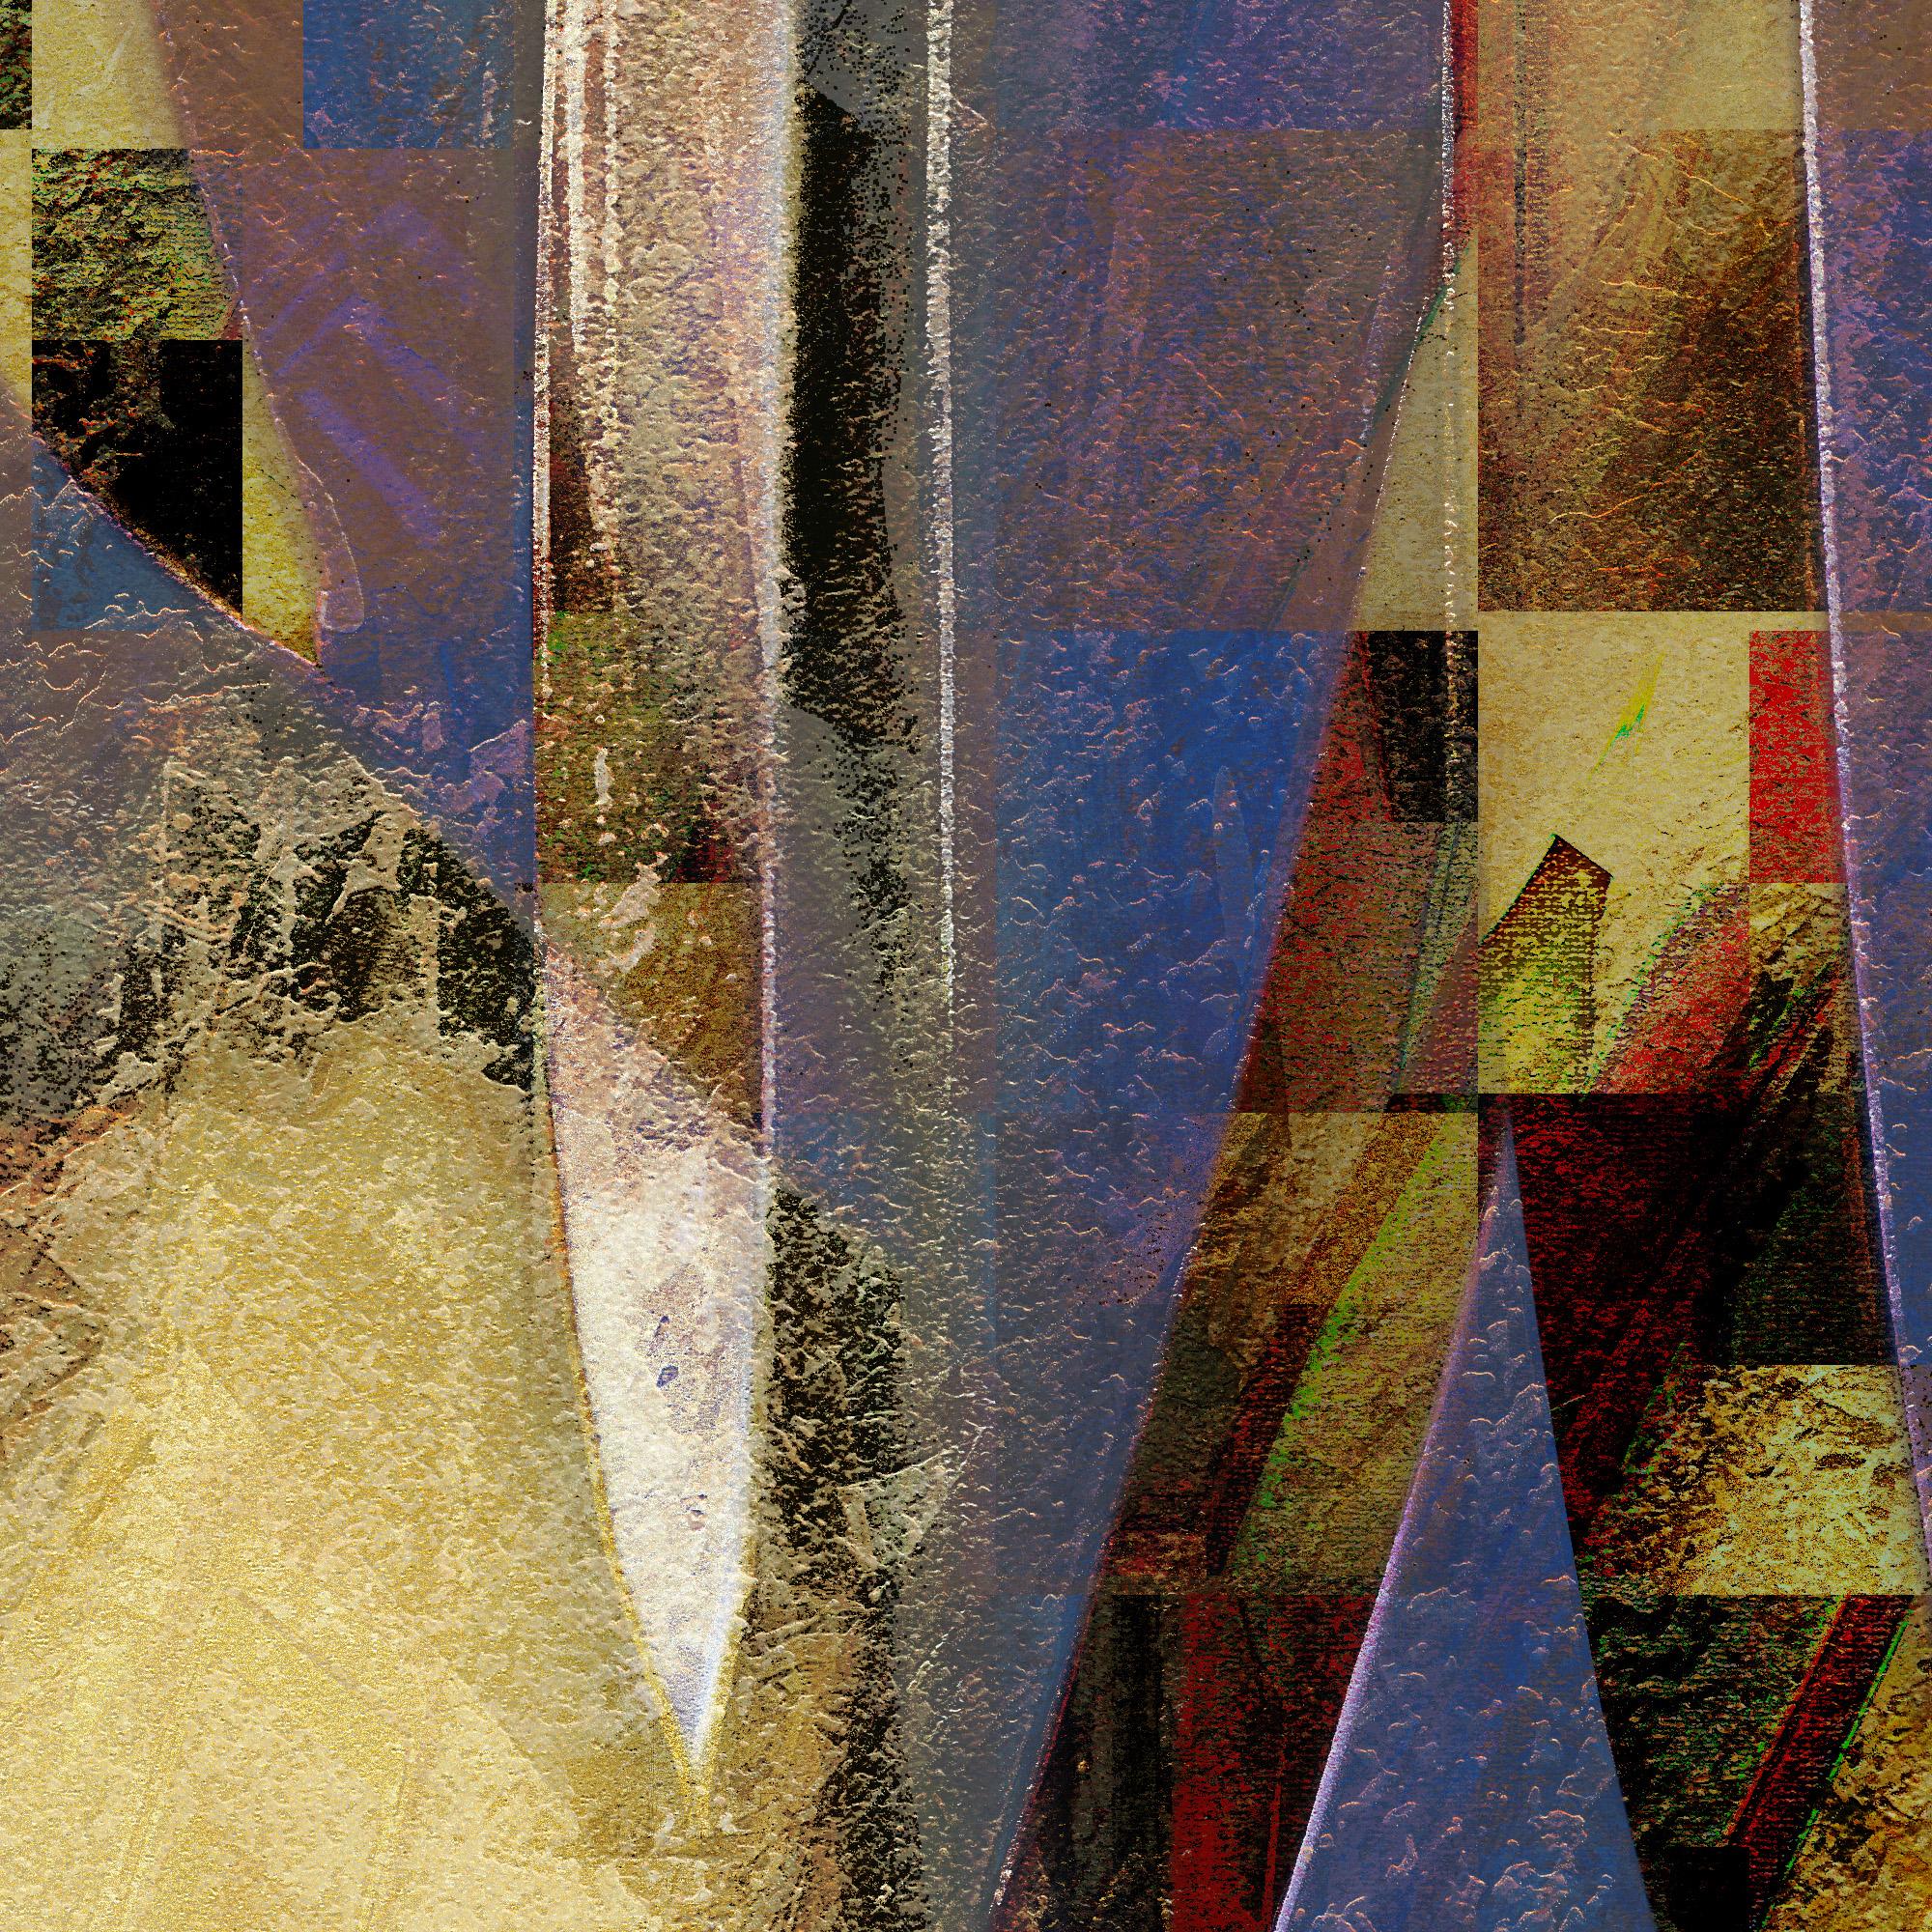 180623_Waking_in_a_Dream_Detail3.jpg